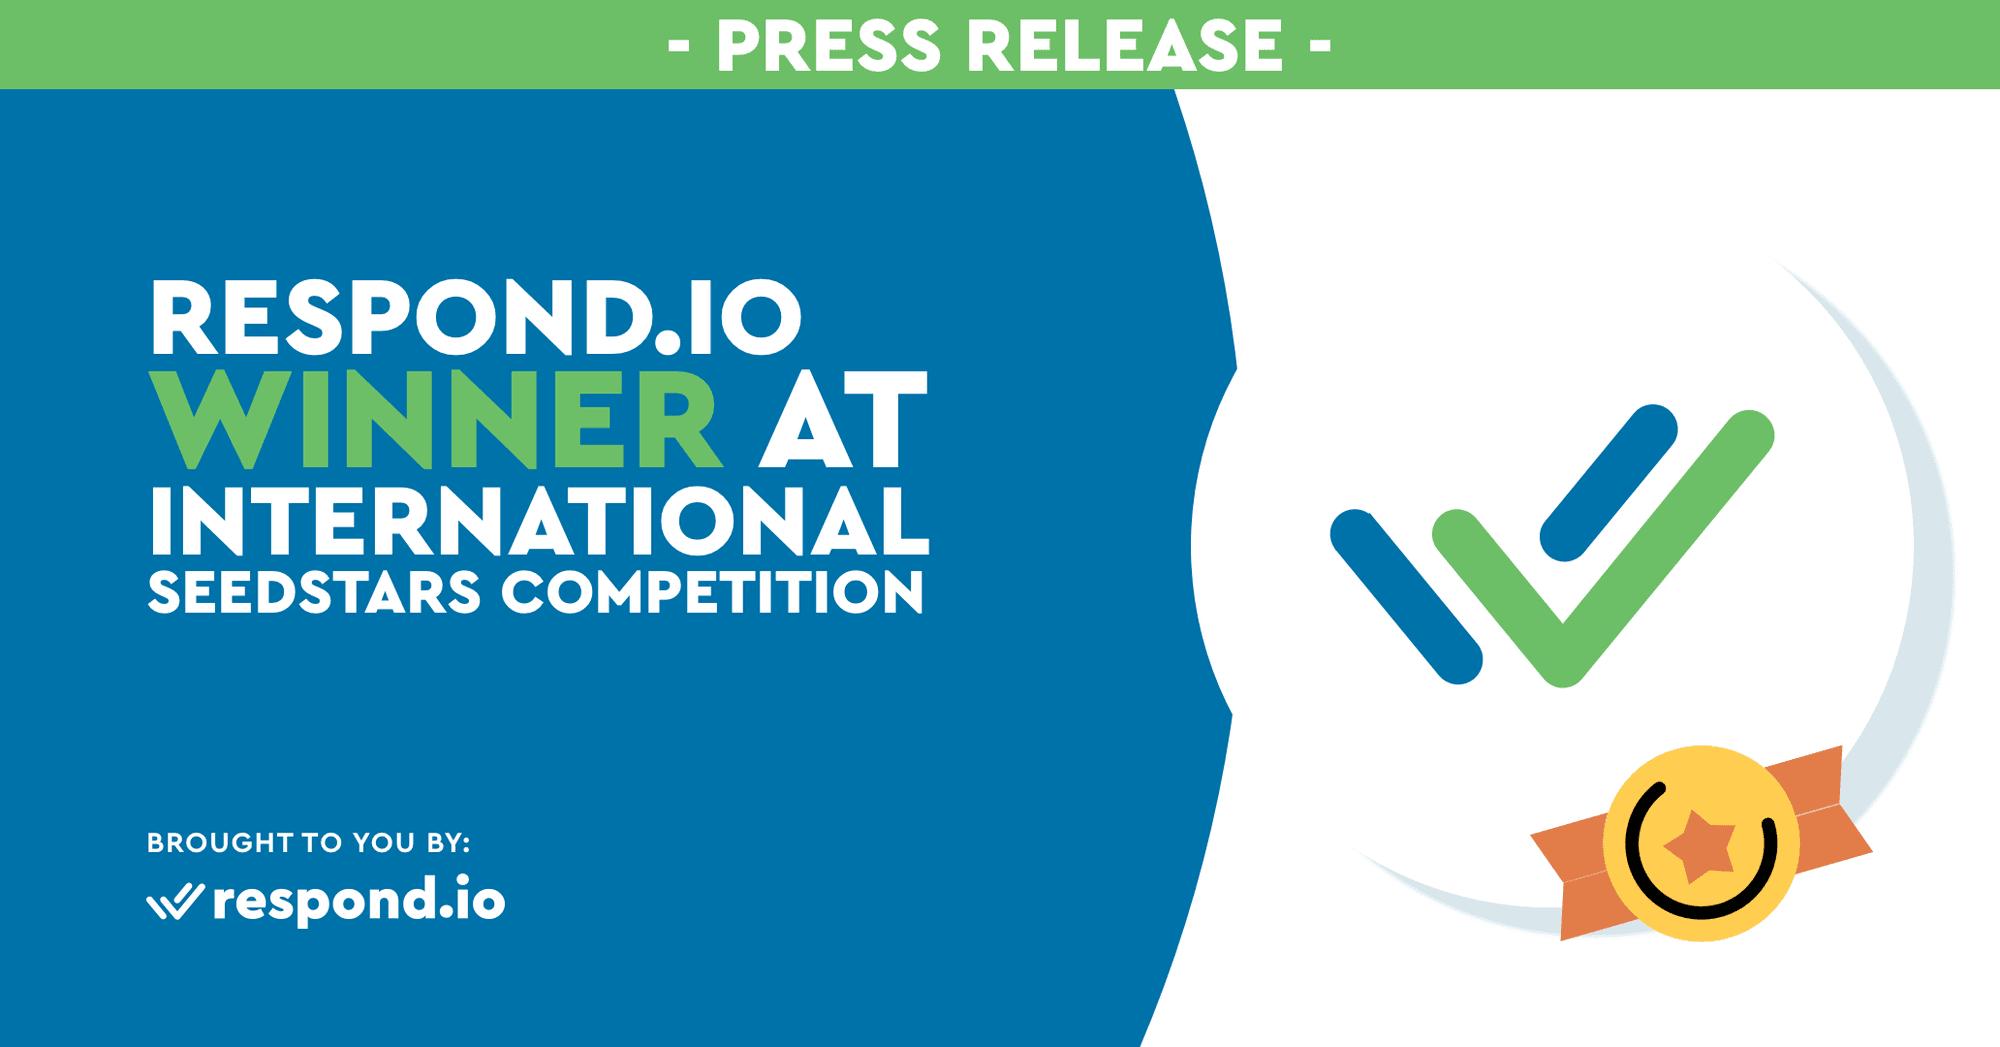 Rocketbots Winner at International Seedstars competition